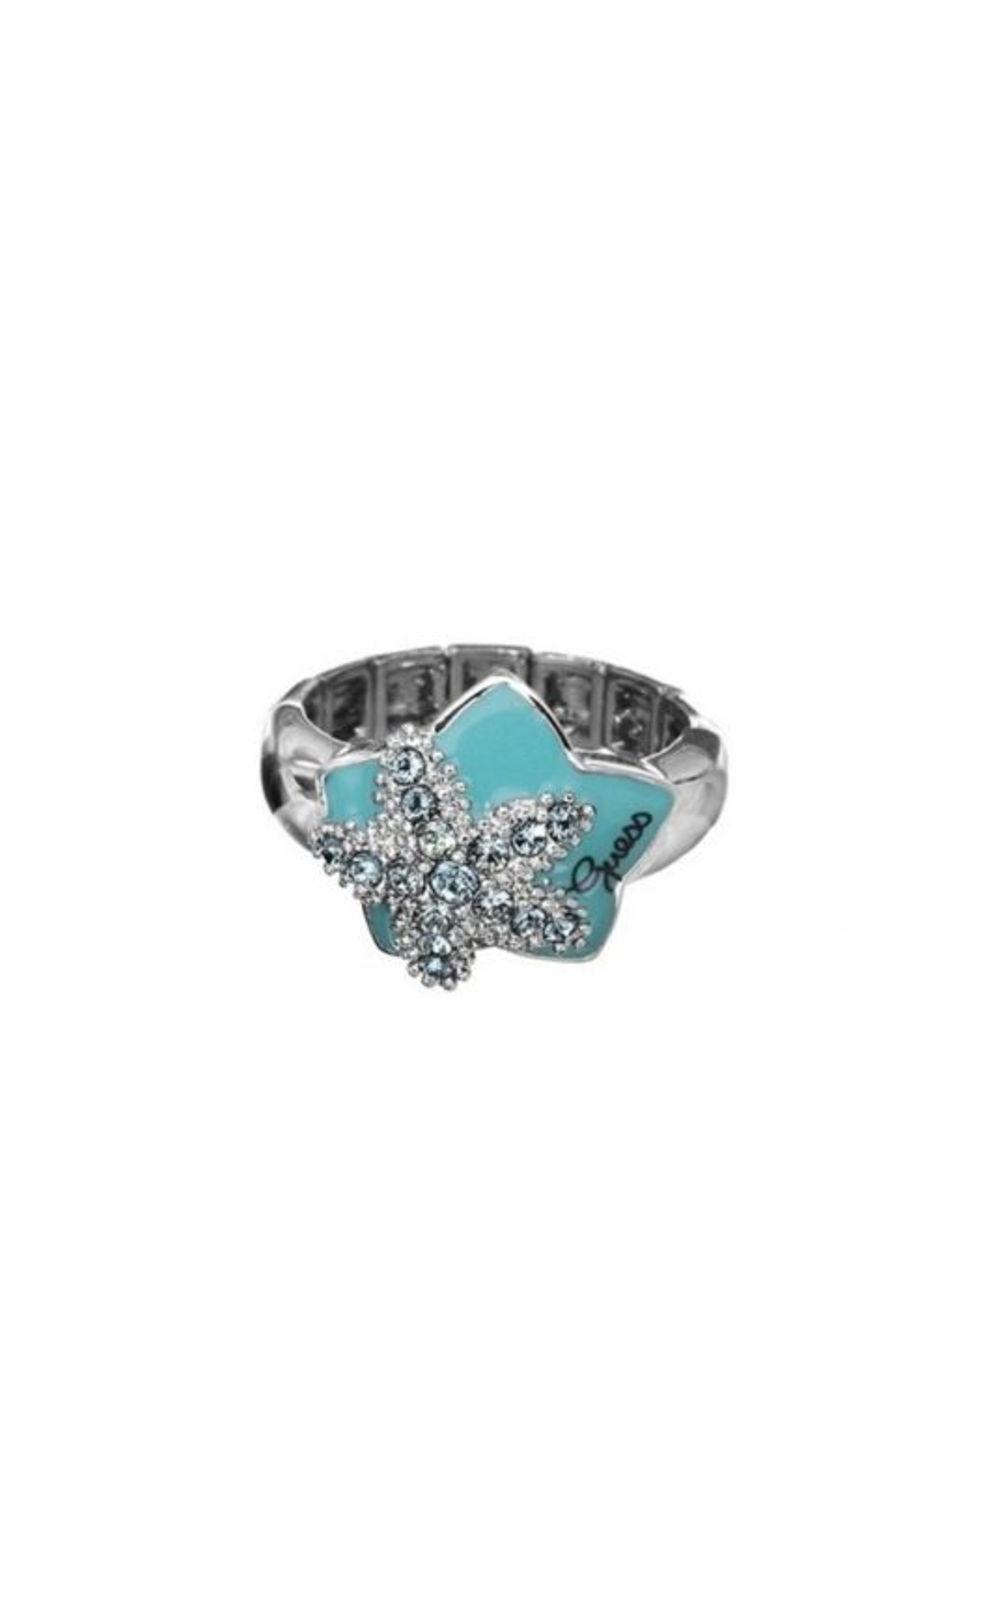 GUESS FAUX UBR41201-L Ασημένιο Δαχτυλίδι Με Αστέρι